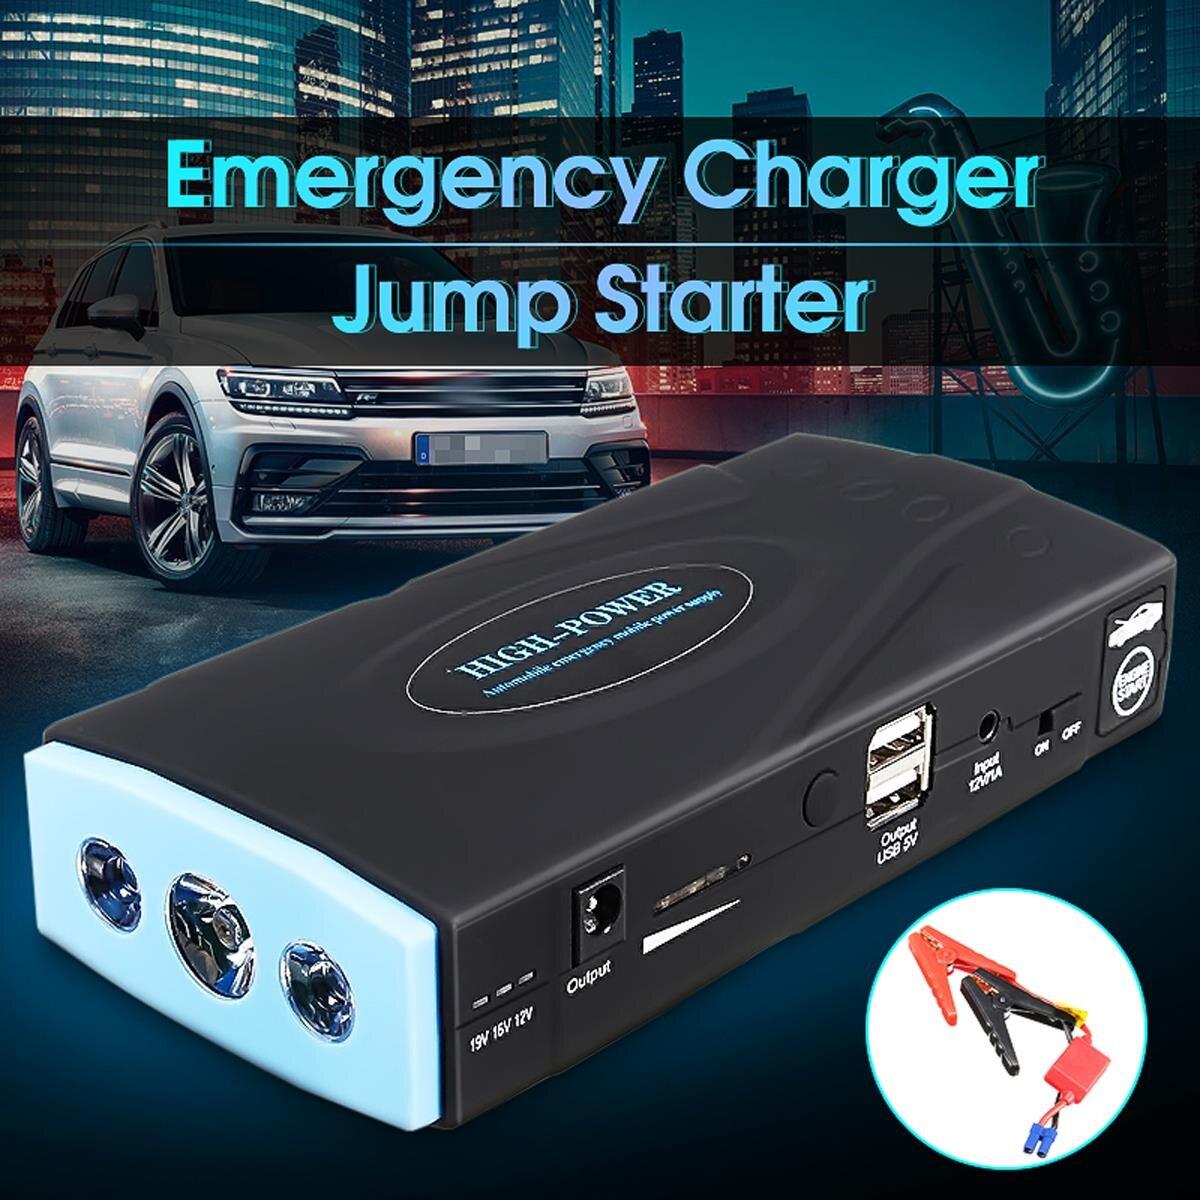 EU/US Plug Universal 12V 38000mAh Car Portable Jump Starter Emergency Power Supply Power Bank Battery Charger